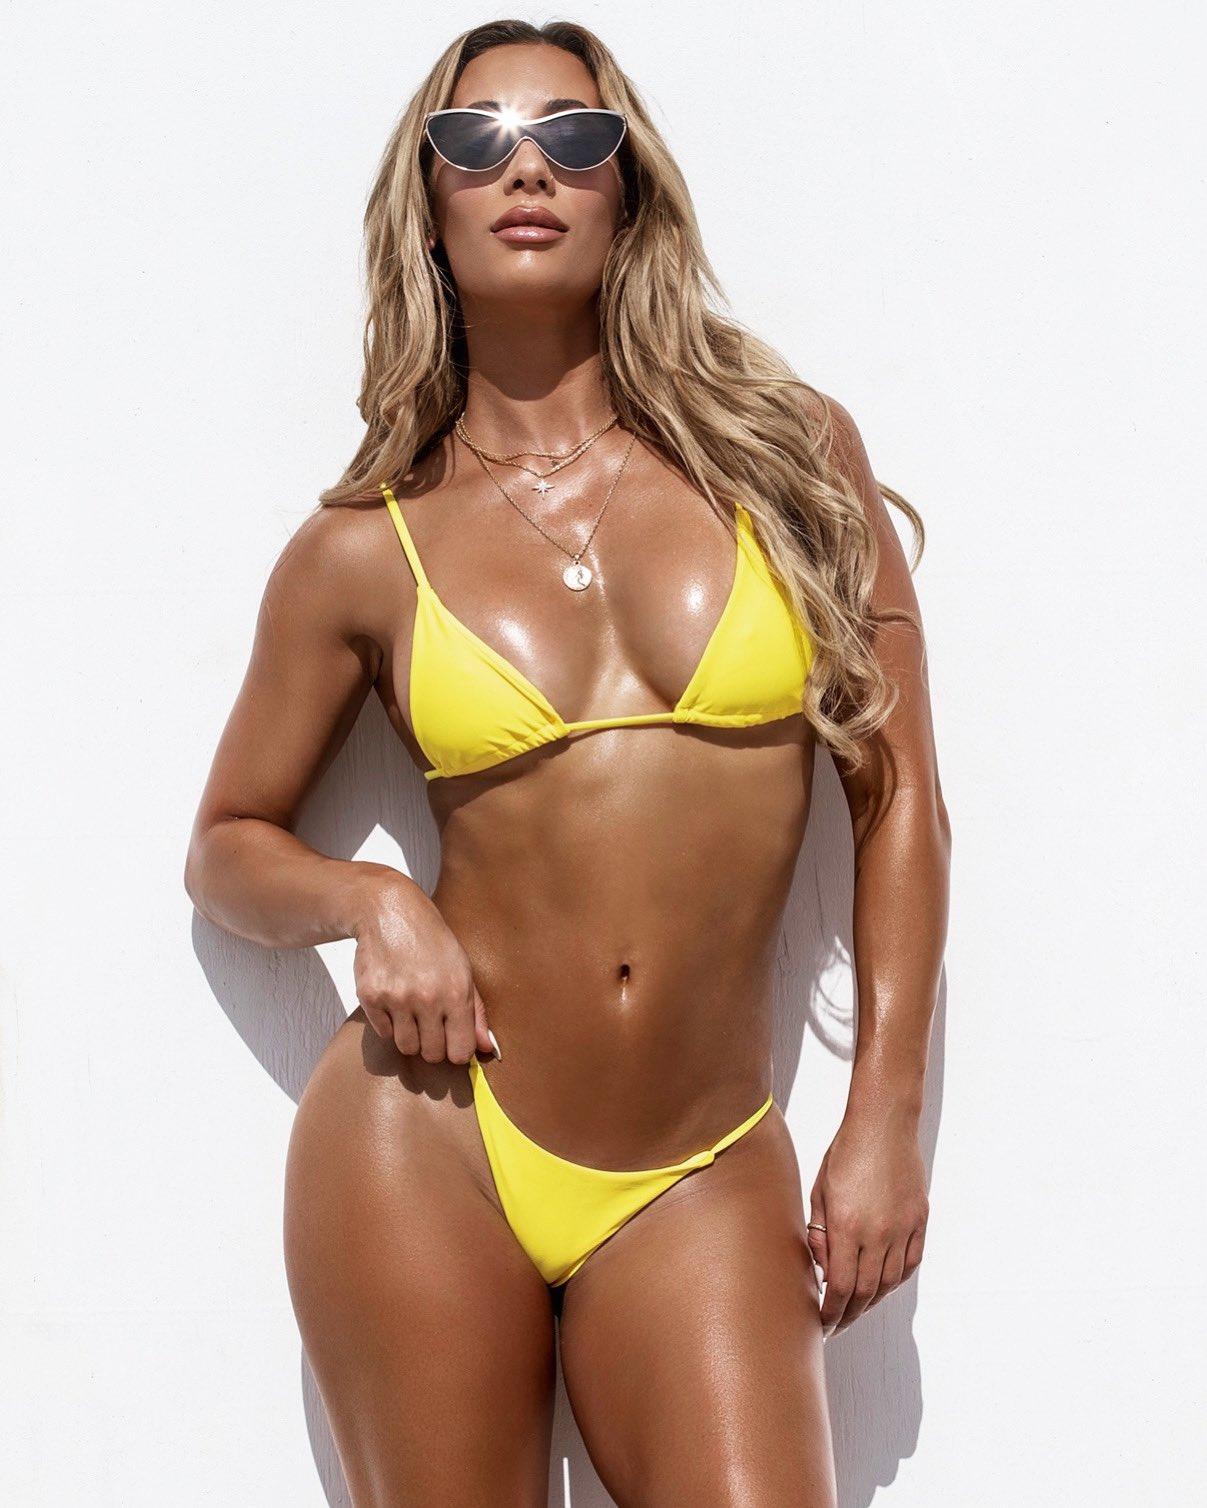 Carmella: WWE Star Posts Super Hot Photo On Instagram Before Return 2